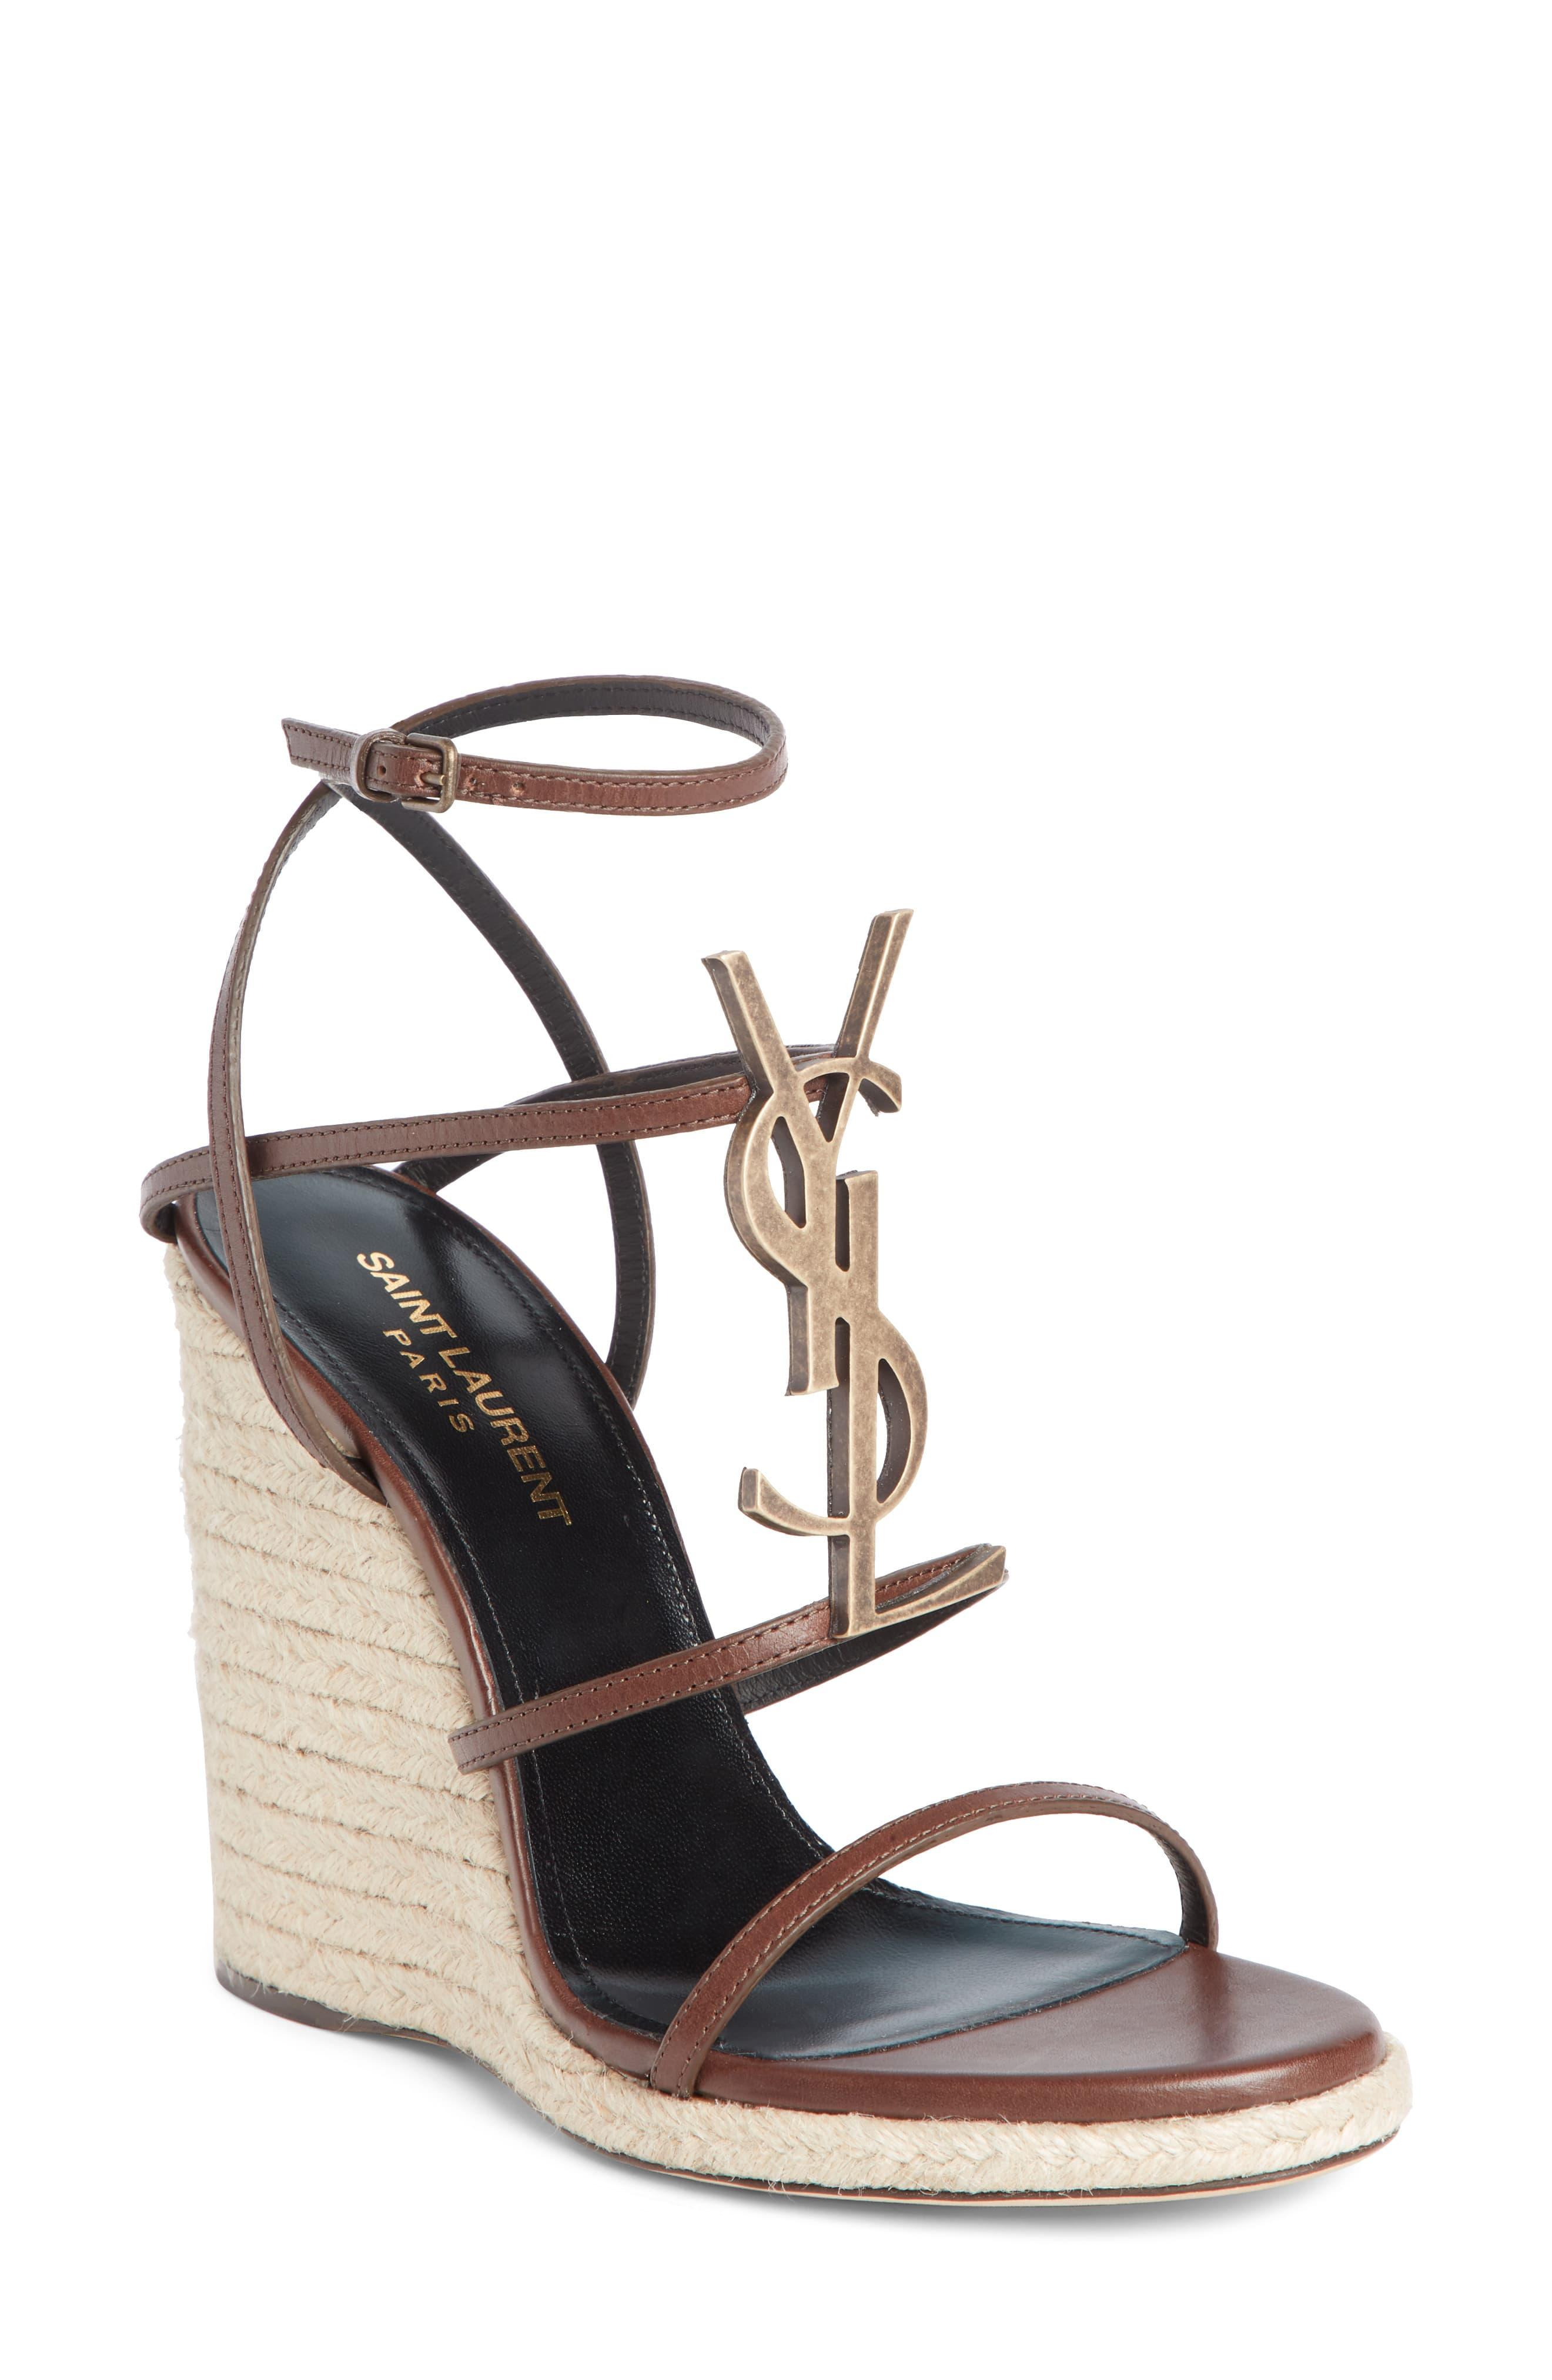 93a8b1c9596 Saint Laurent Cassandra Ysl Logo Wedge Sandal in Brown - Save 40% - Lyst